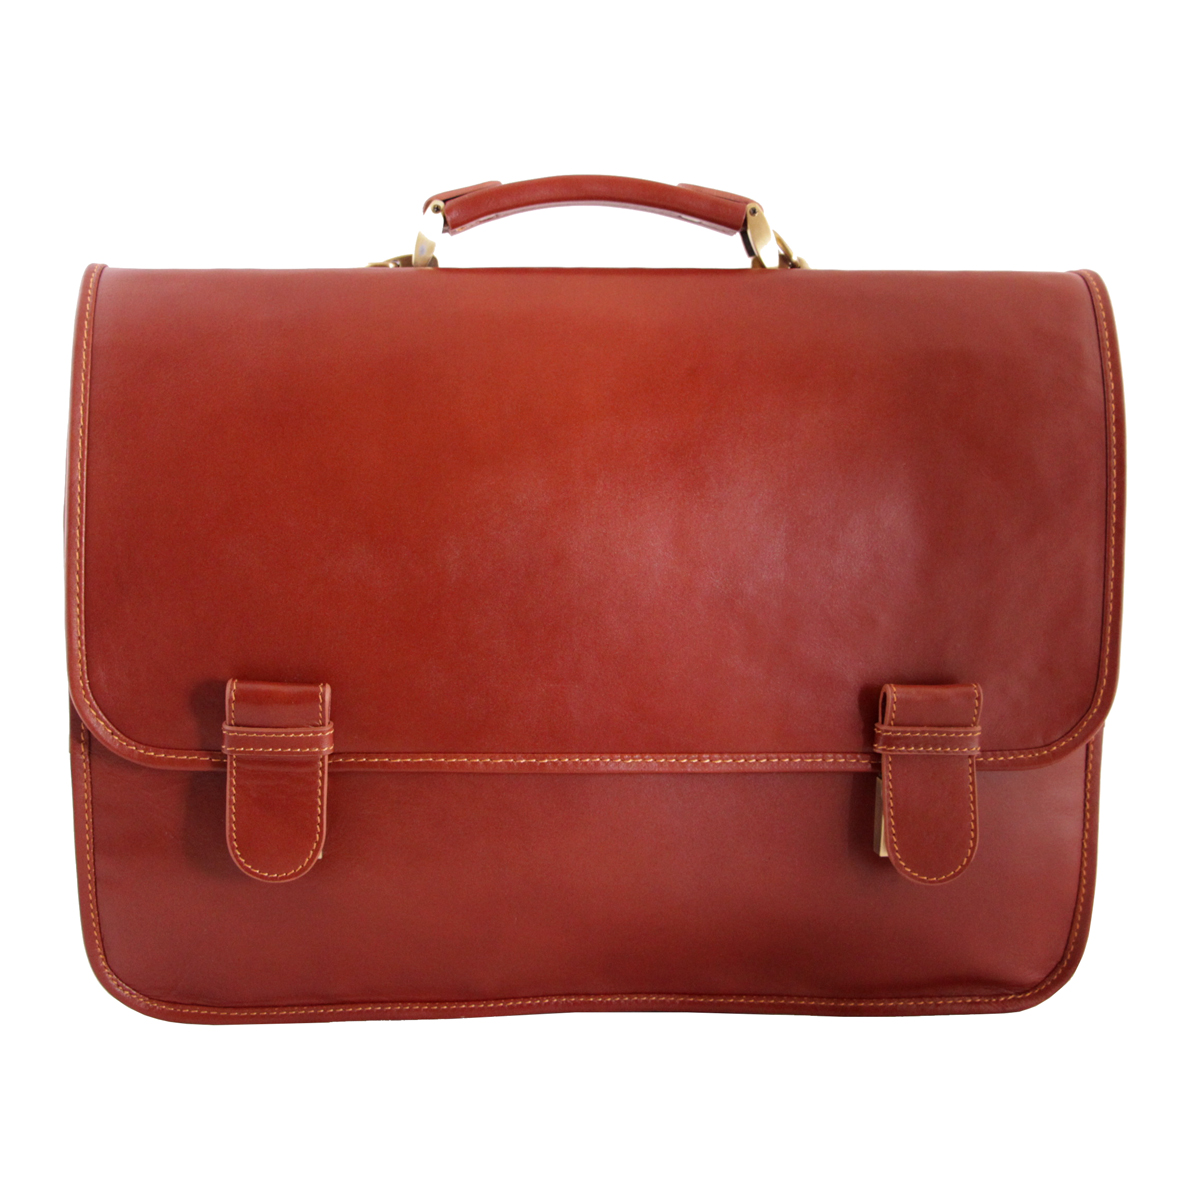 کیف اداری چرم طبیعی آدین چرم مدل DL39